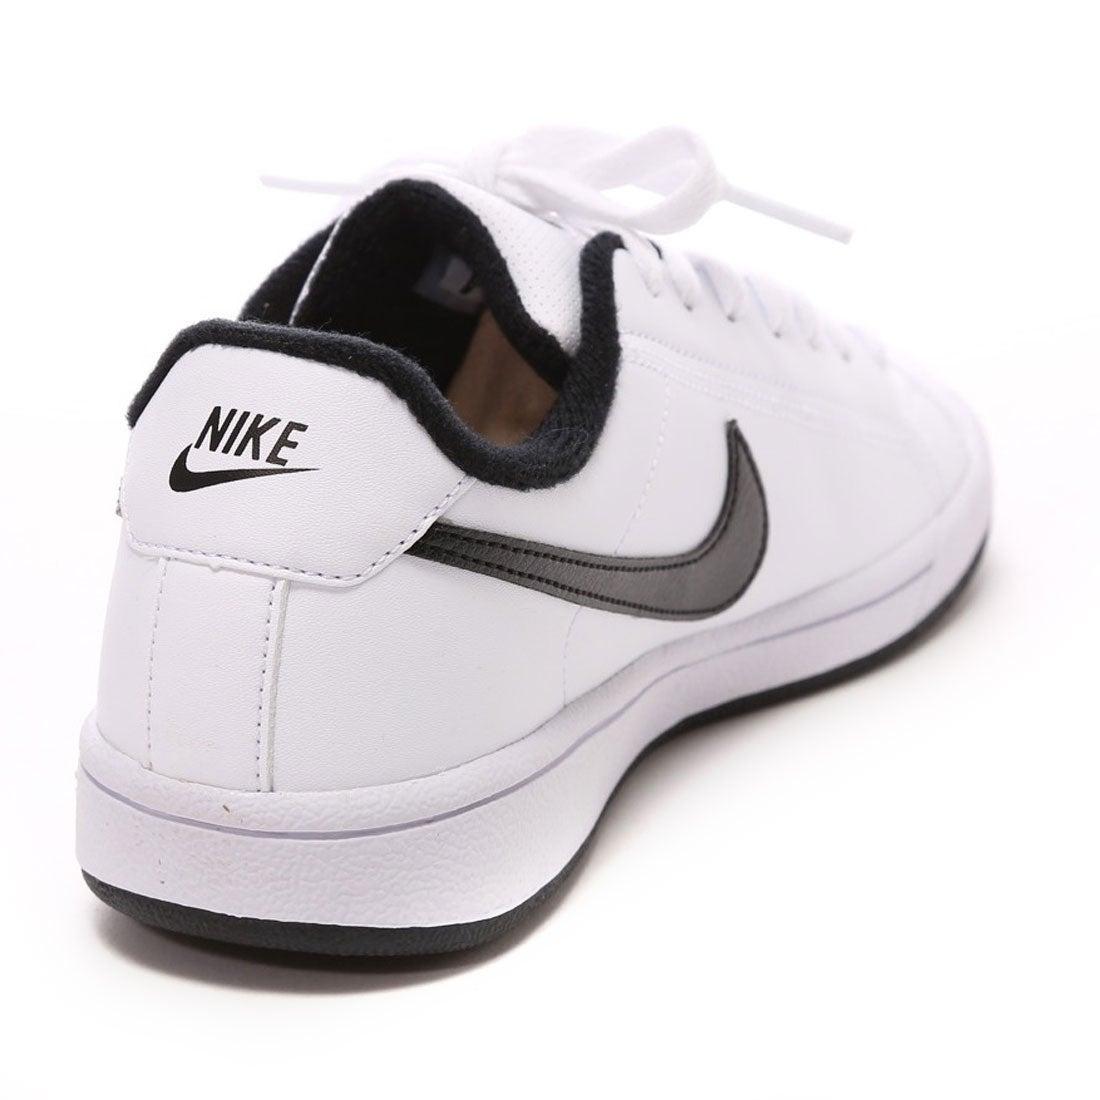 Clan SIDA temporal  ナイキ NIKE atmos MAIN DRAW SL(WHITE/BLACK) -靴&ファッション ...